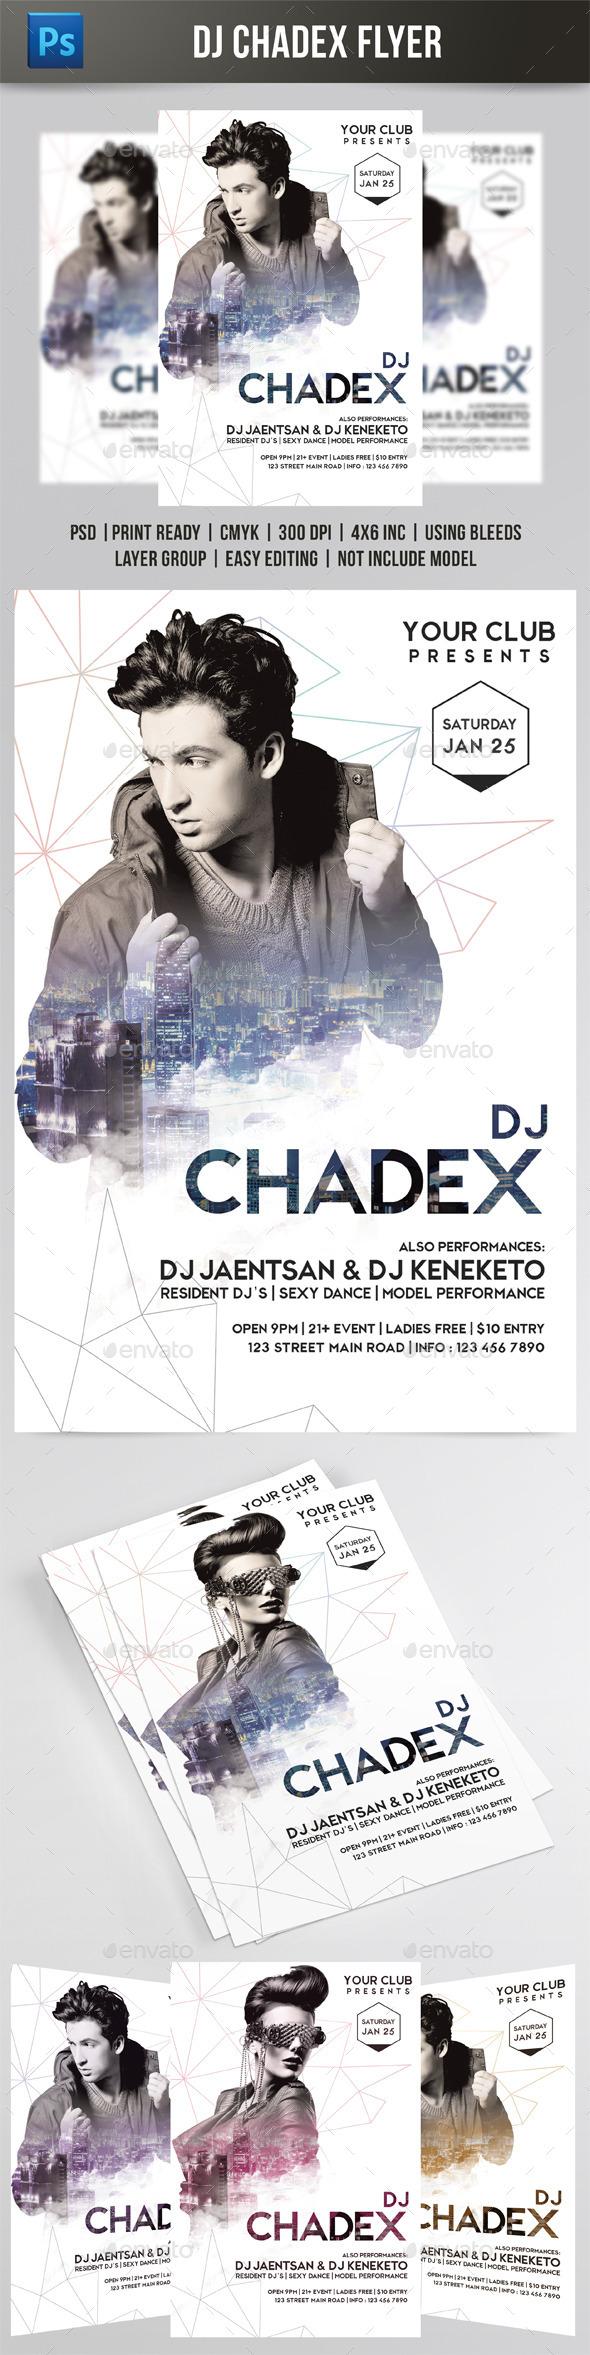 DJ Chadex Flyer  - Events Flyers